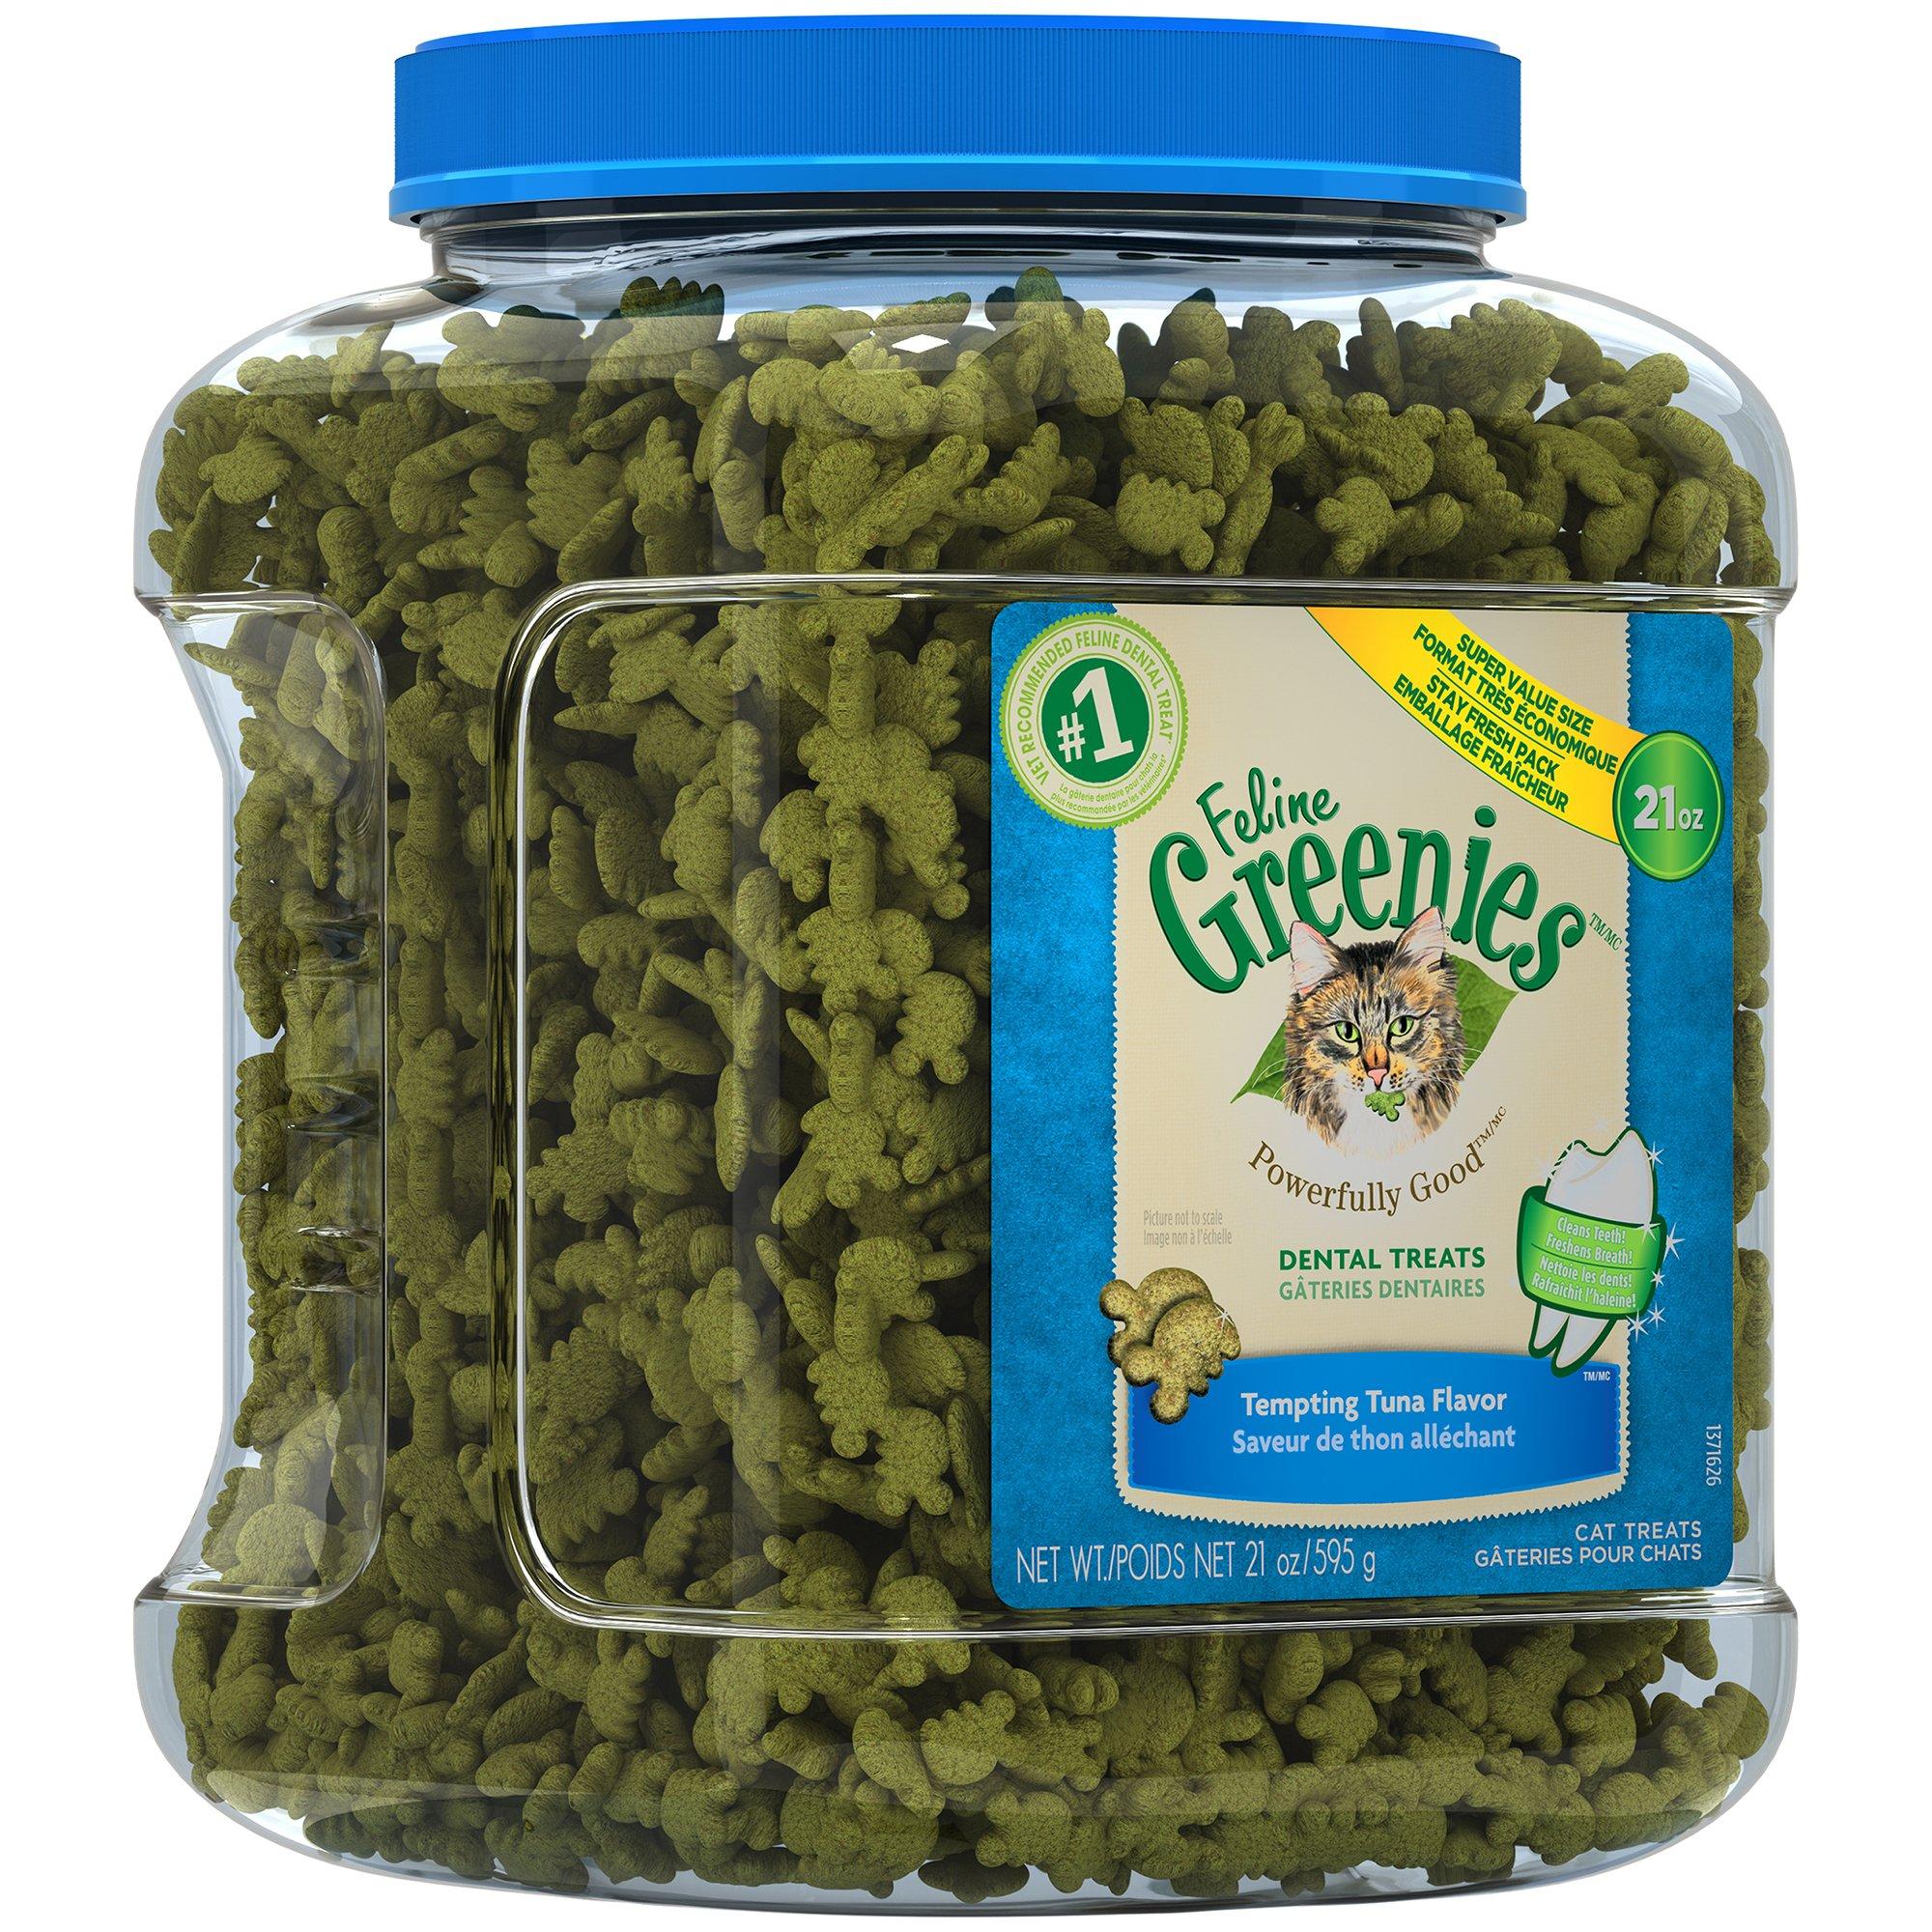 Greenies FELINE Dental Treats Tempting Tuna Flavor 21 Ounces